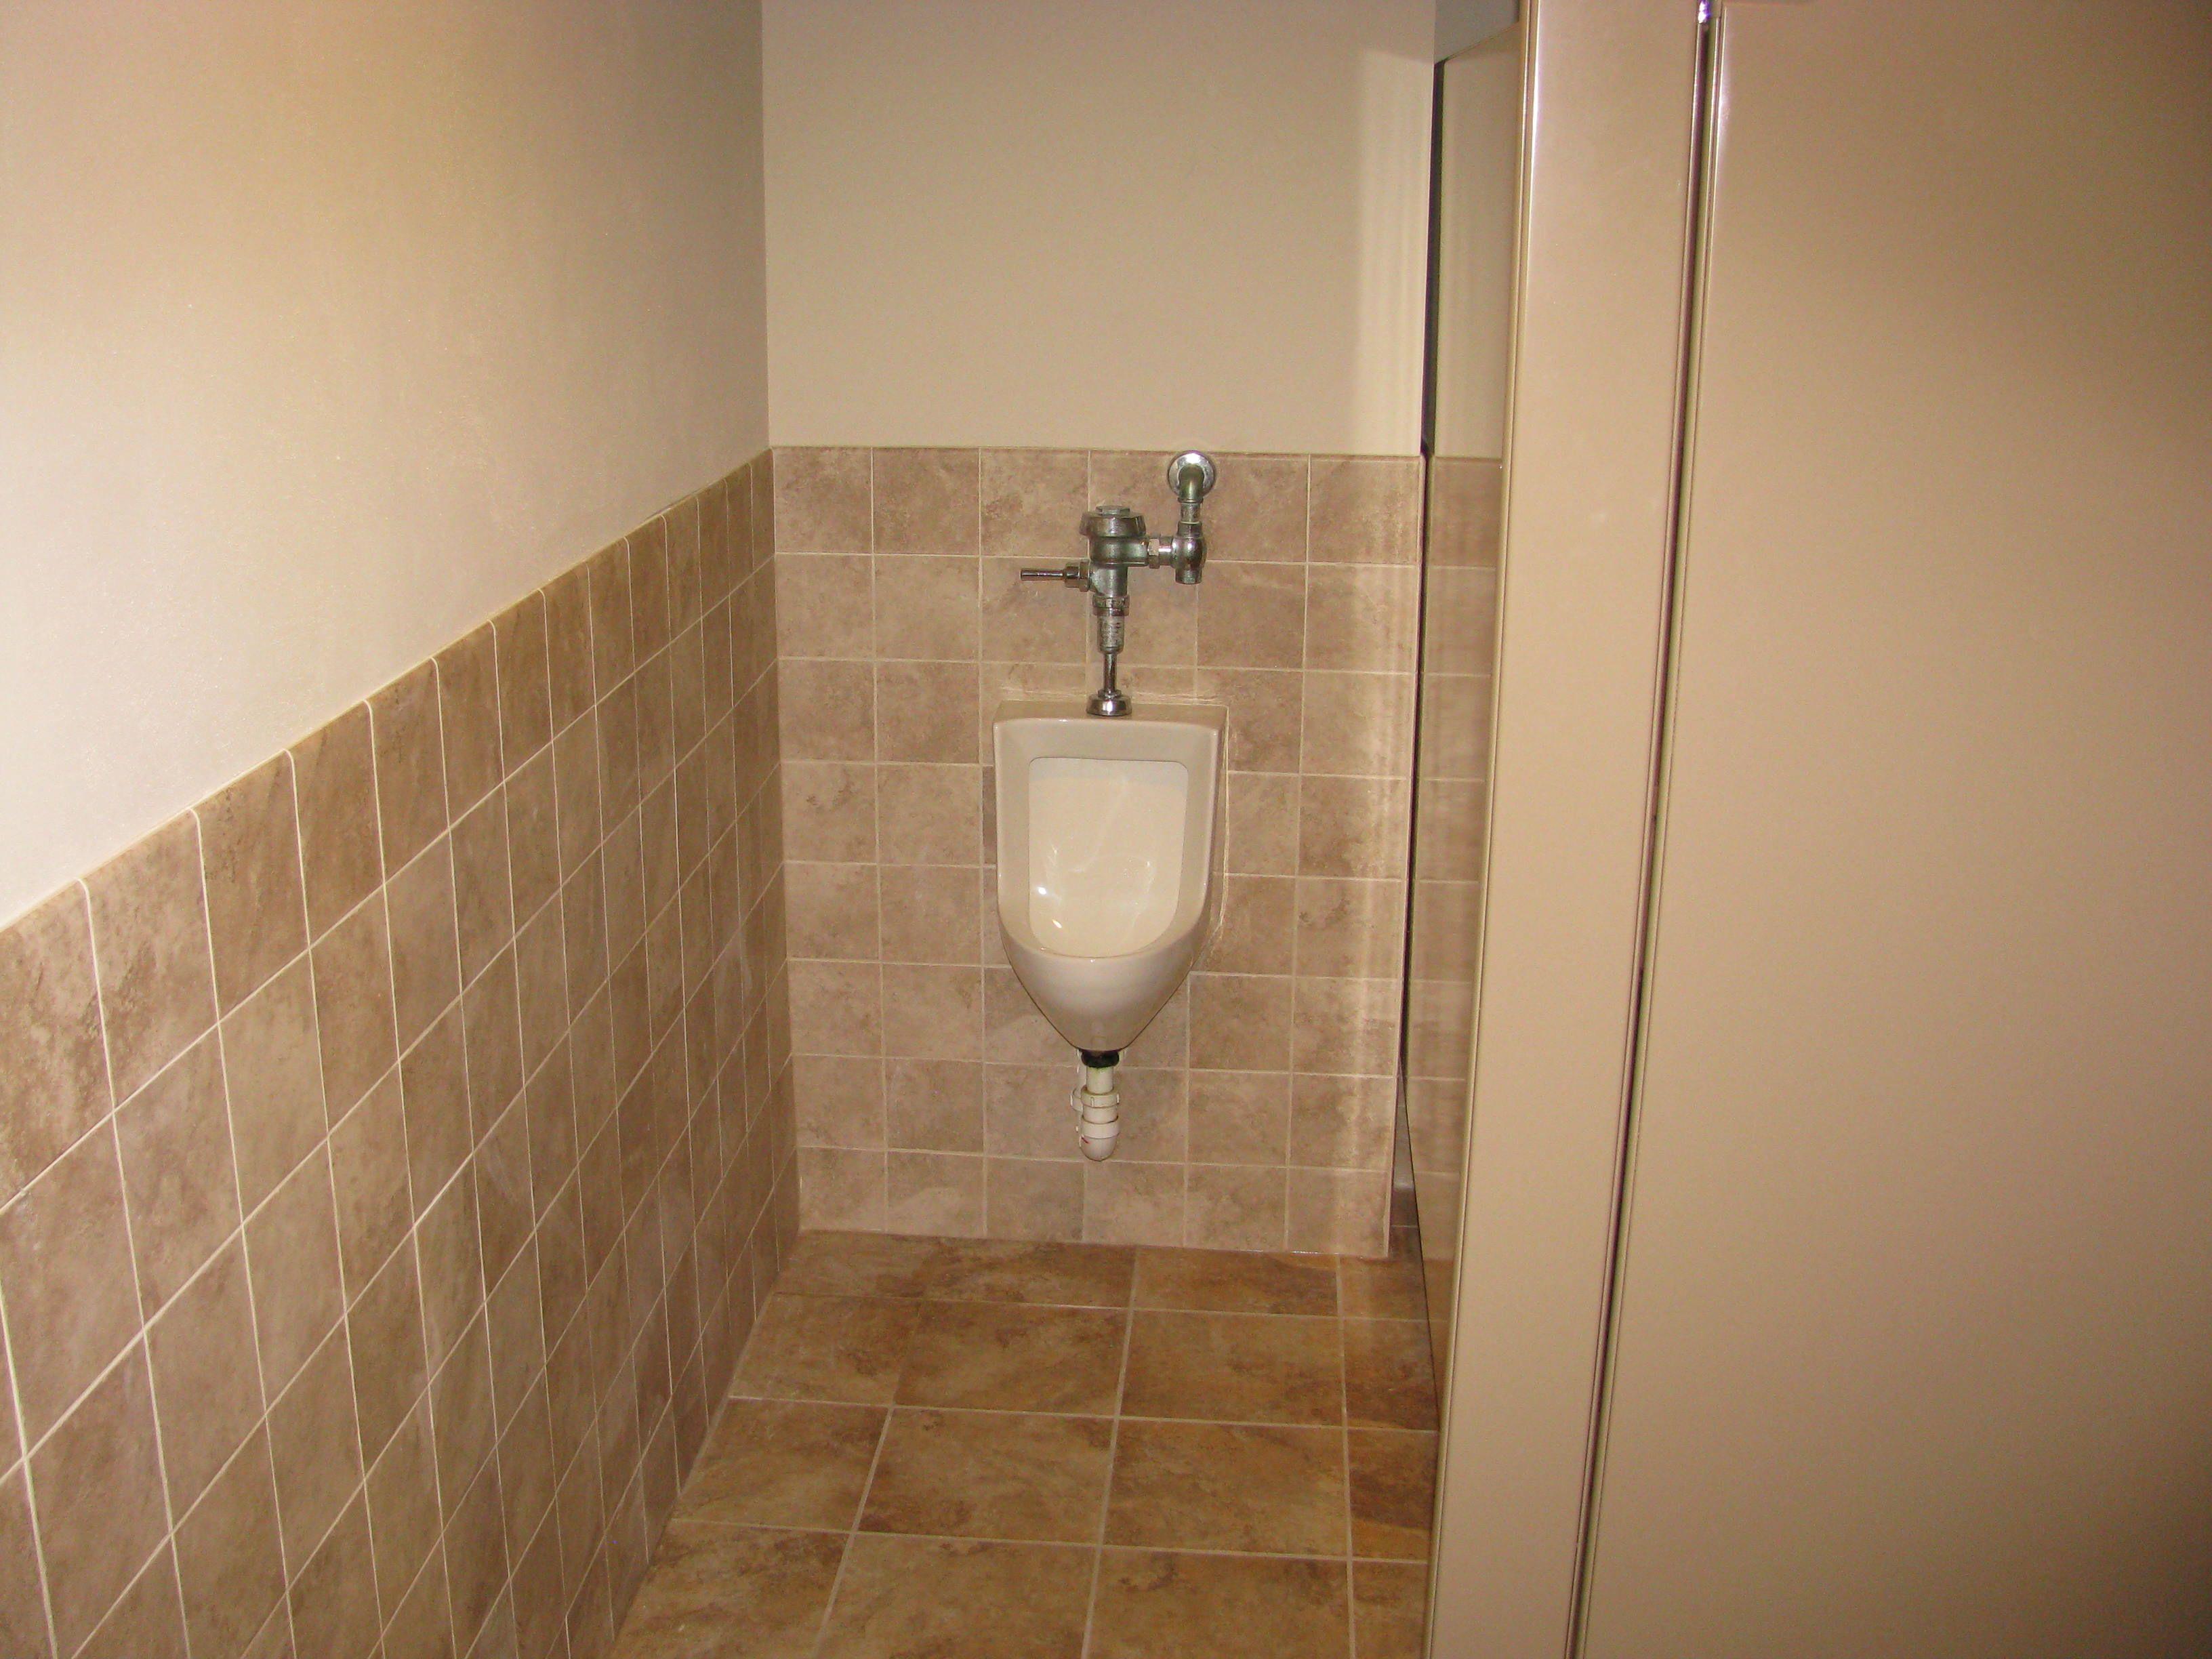 Commercial Bathroom Design Ideas | Commercial Bathrooms » Commercial  Bathroom, Porcelain Tile